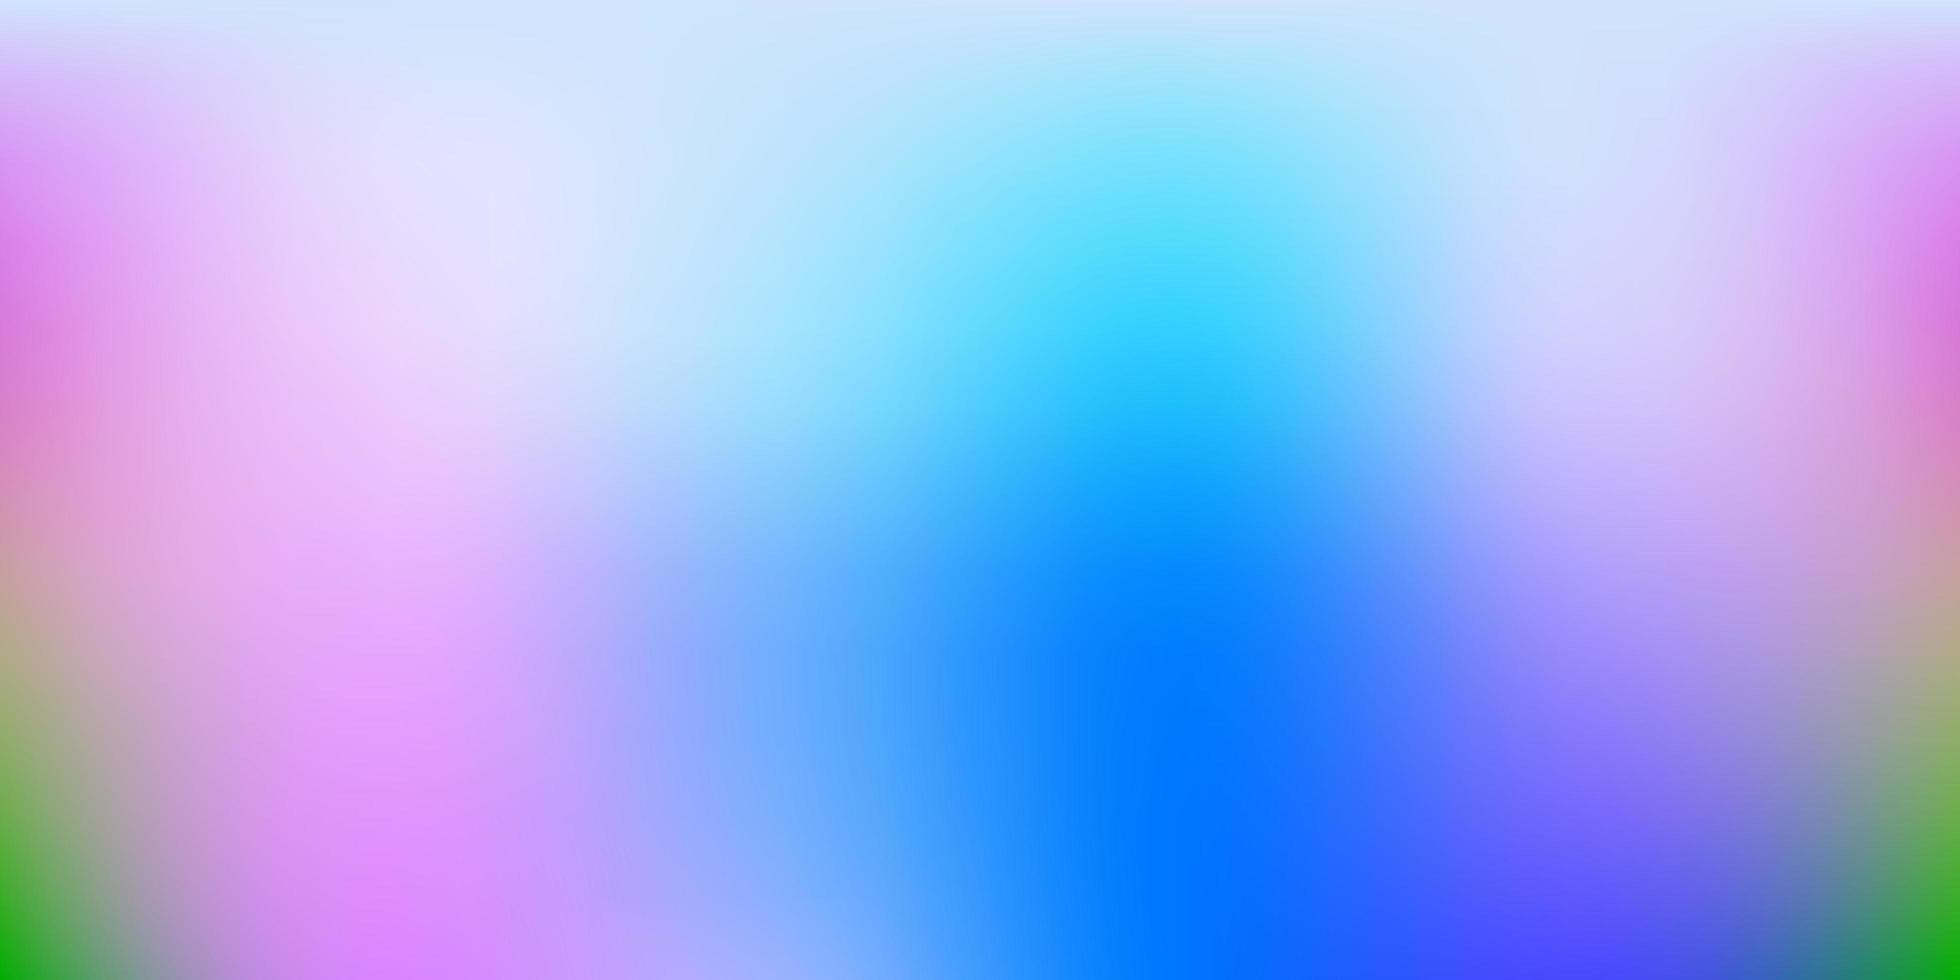 Fondo de desenfoque de vector azul claro, rojo.